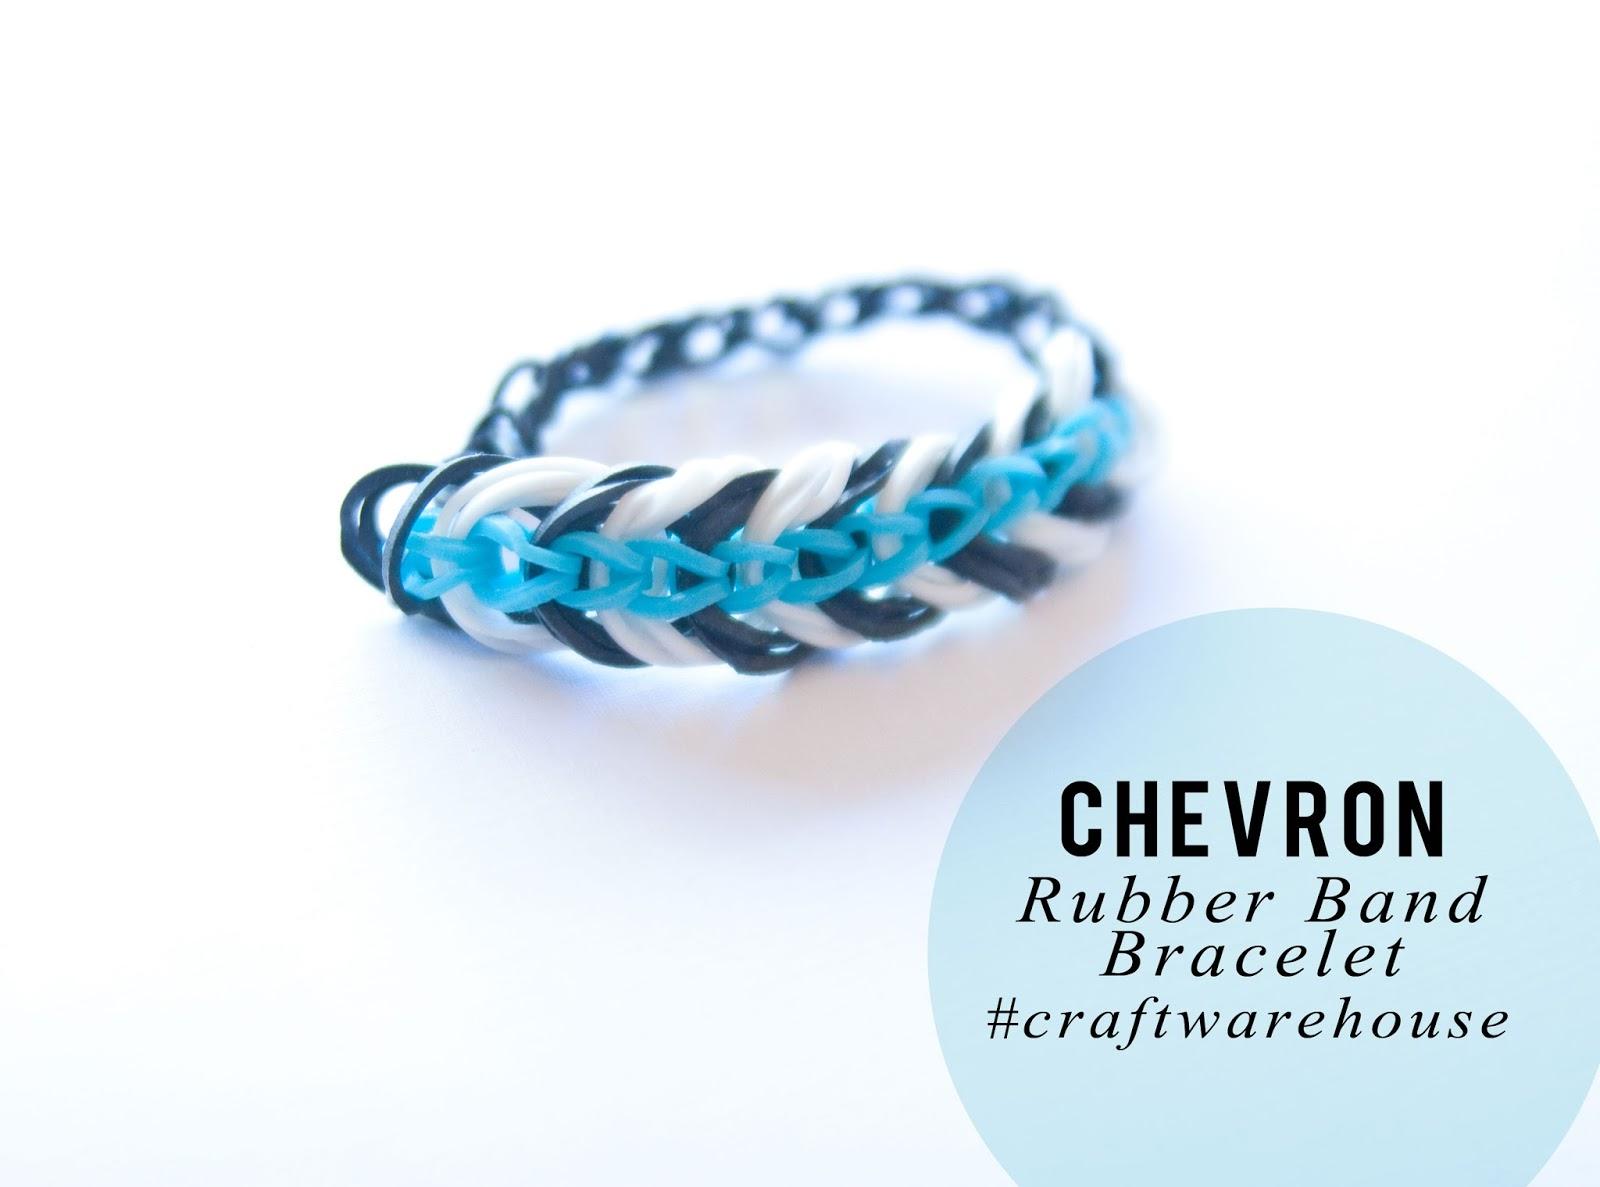 craft warehouse rubber band bracelets create often